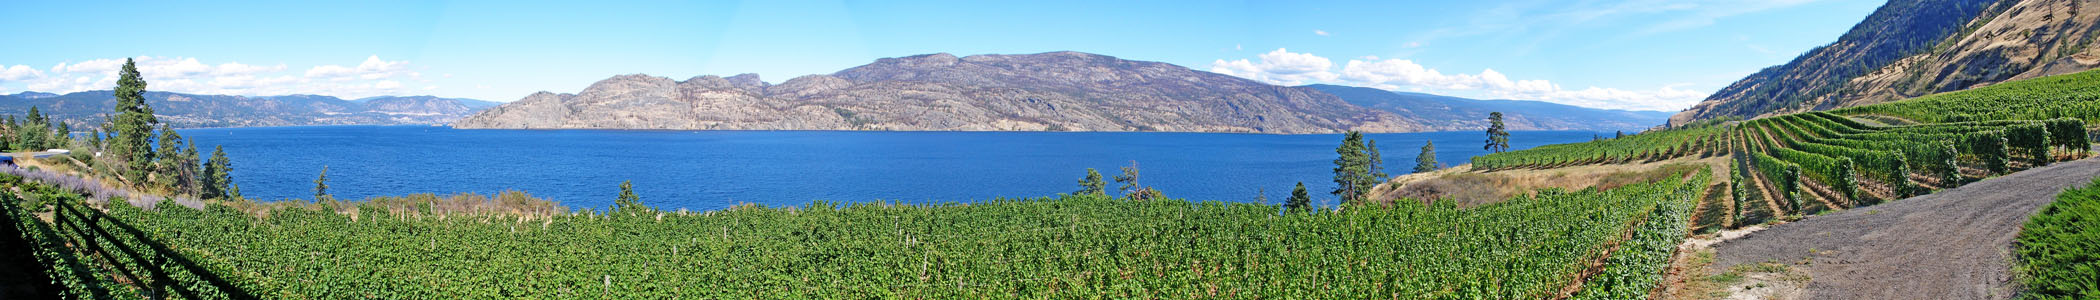 Okanagan_banner_Greata_Vineyard_view